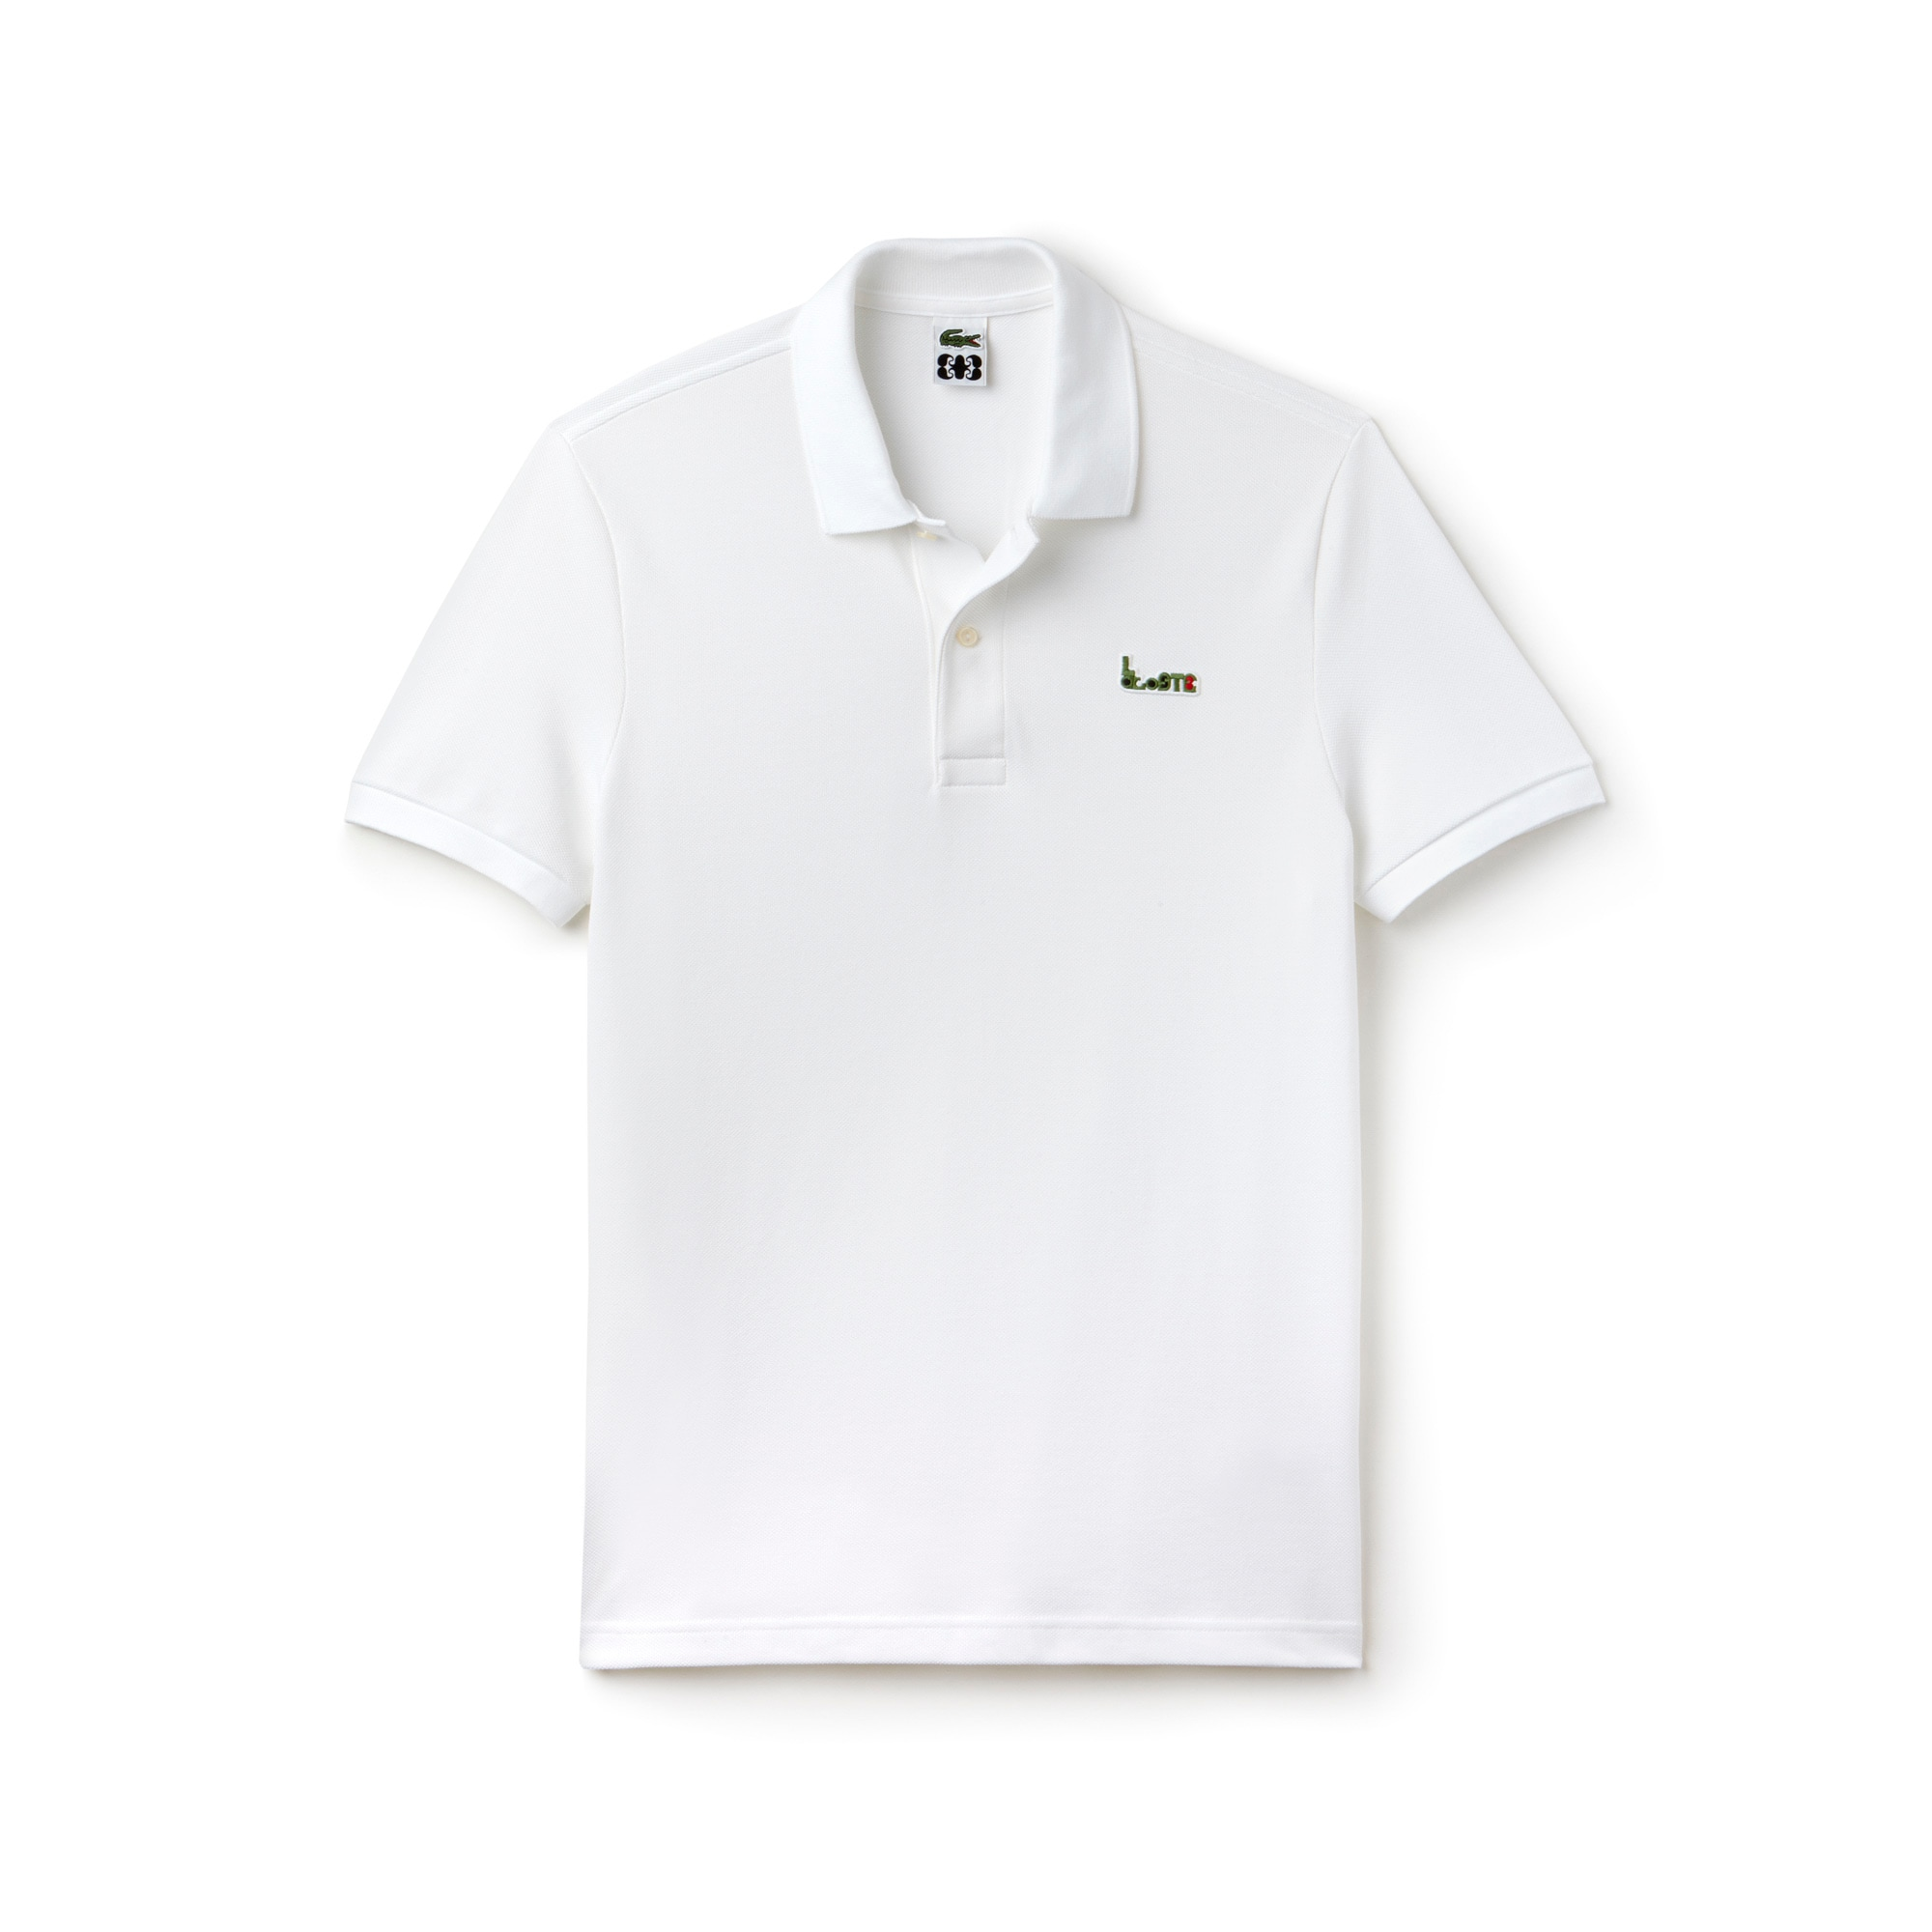 Slim Fit Herren-Poloshirt MM COLLAB aus dickem Baumwoll-Piqué